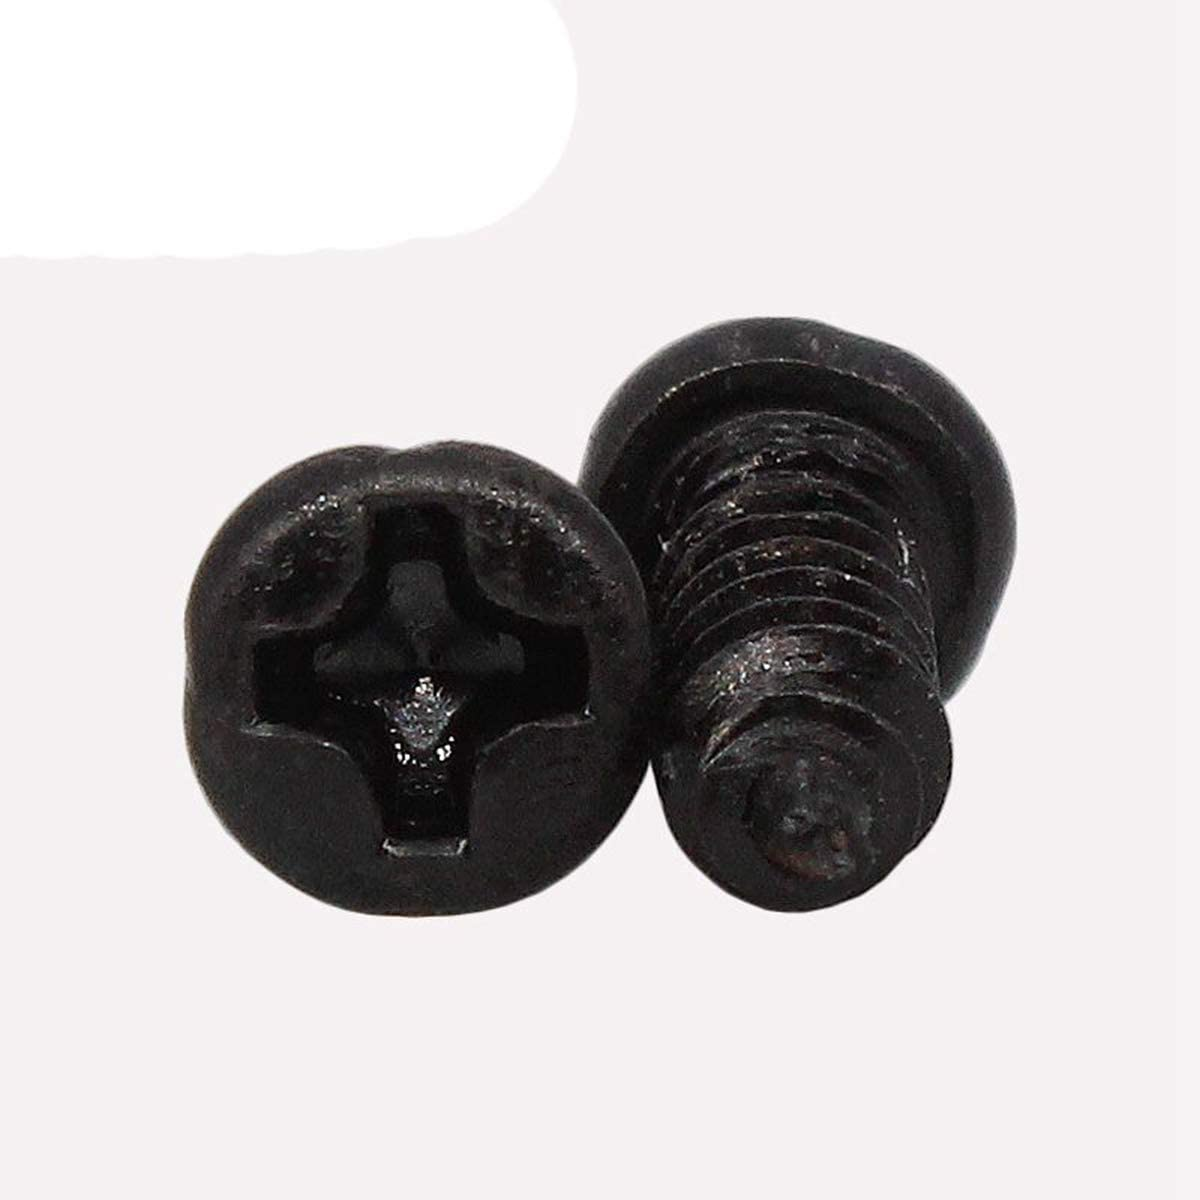 M1 Tornillo de 100 piezas M1 M1.2 M1.4 M1.7 M2.3 M2.6 M2 M3 Phillips Micro Tornillos de cabeza troncoc/ónica port/átiles autorroscante Tornillos electr/ónico peque/ño de madera 100 piezas 3mm